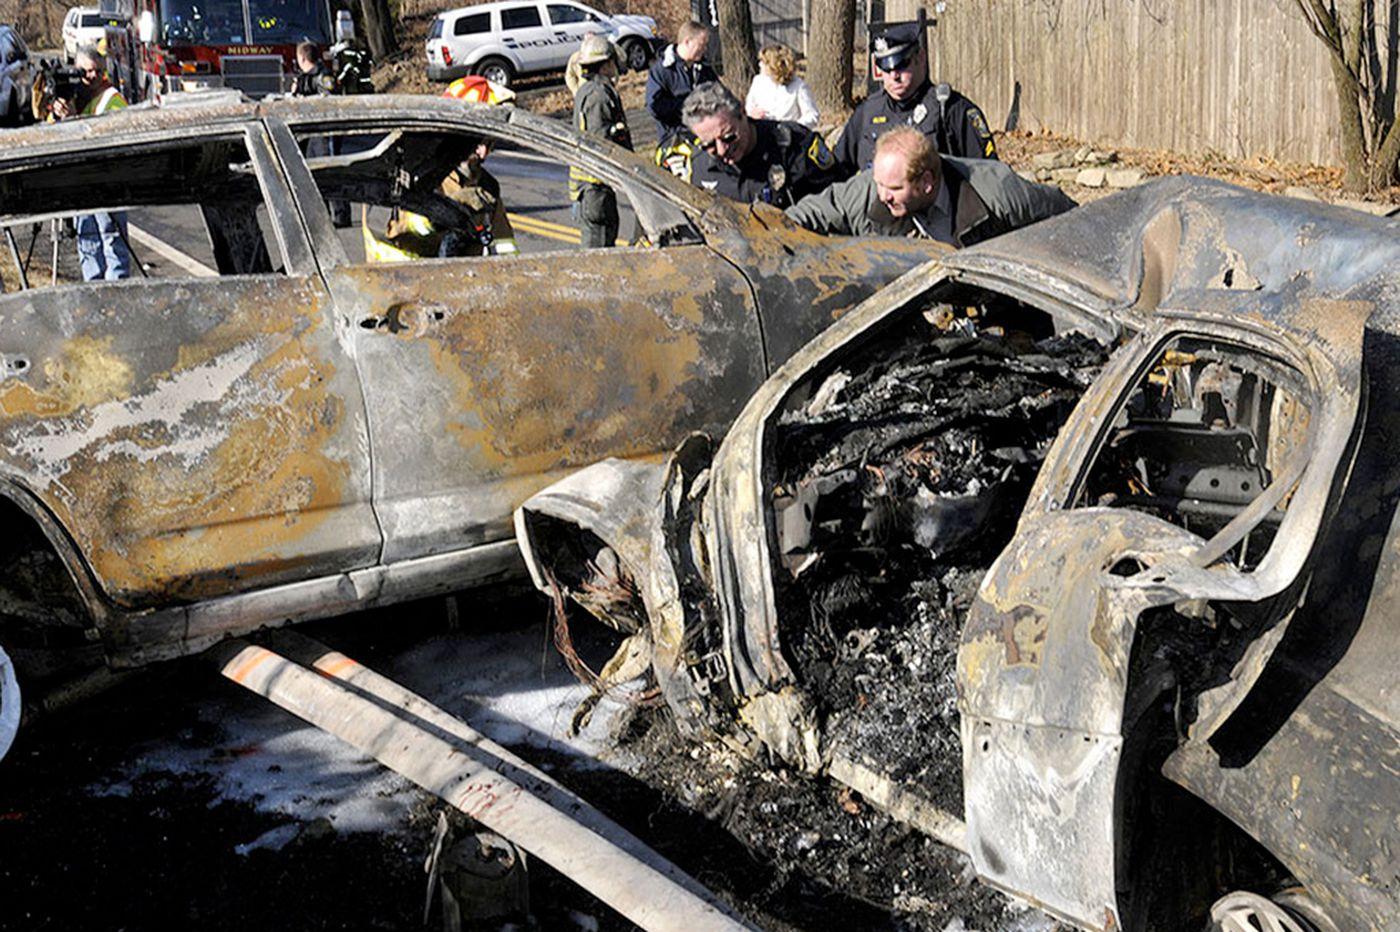 Pa.'s DUI laws endanger drivers, senators hear